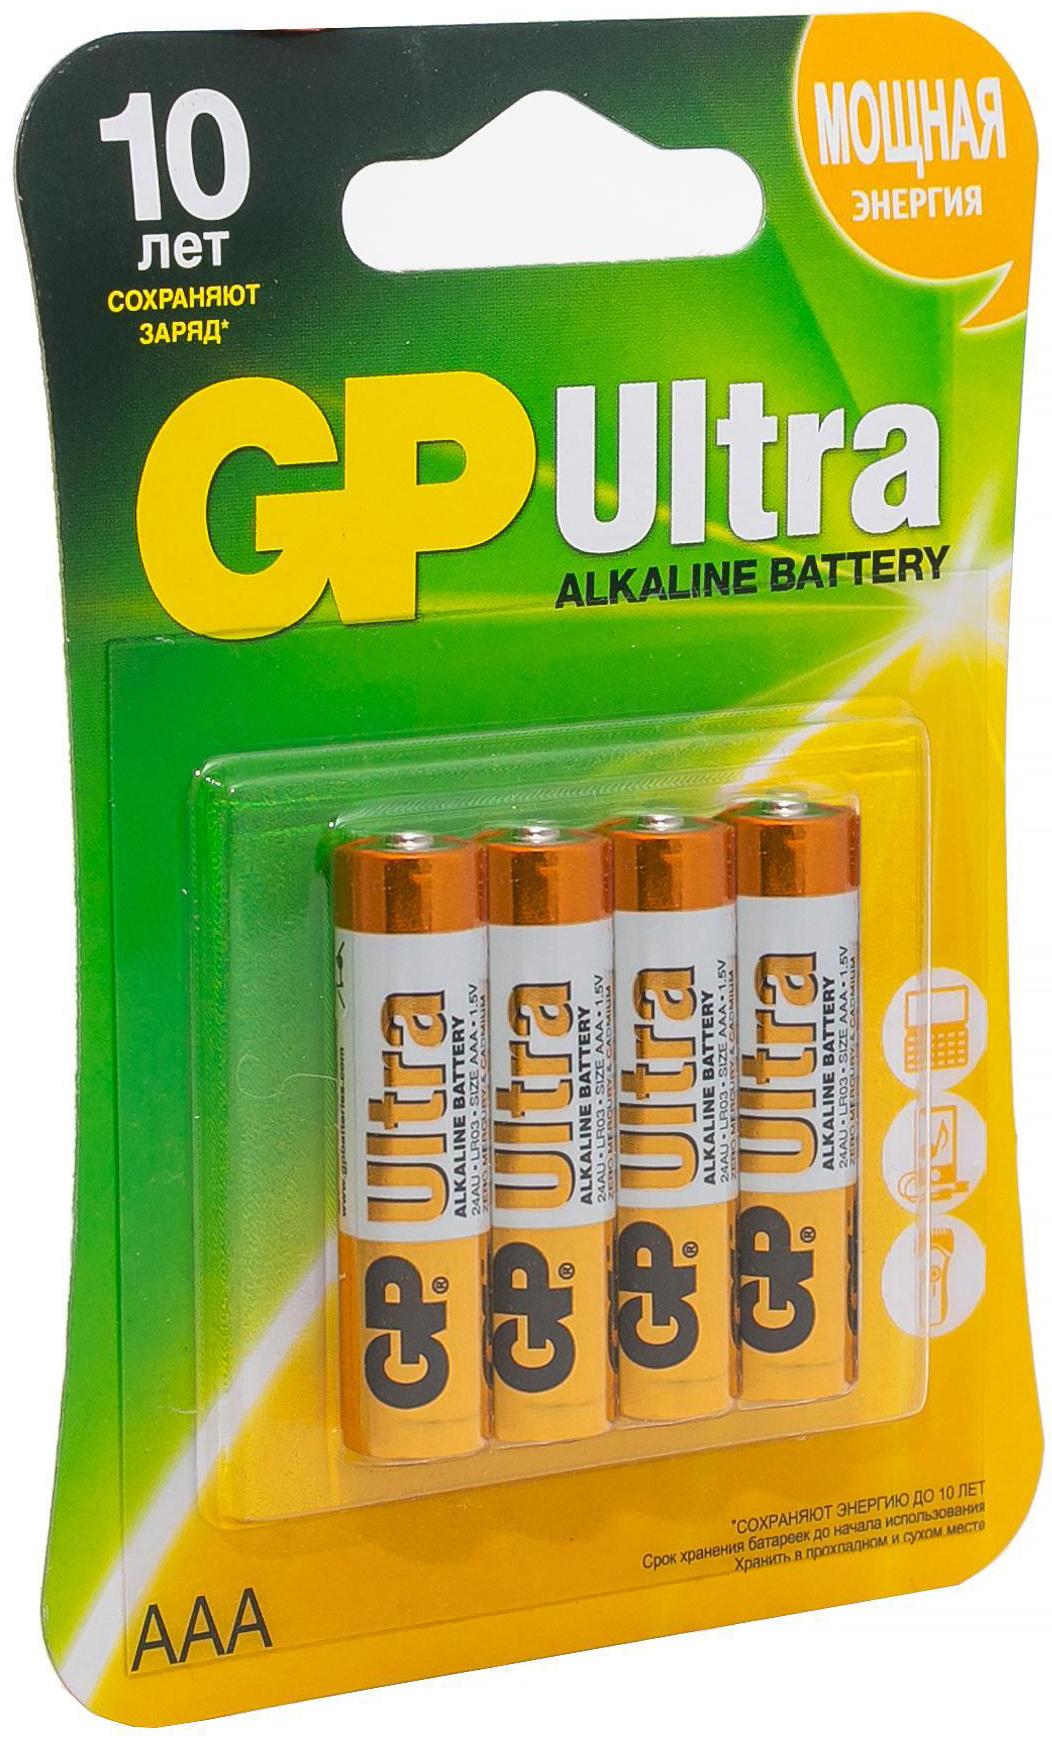 Фото - Алкалиновые батарейки GP Ultra Alkaline 24А AАA (Блистер, 4 шт) алкалиновые батарейки gp ultra alkaline 13а типоразмера d блистер 2 шт